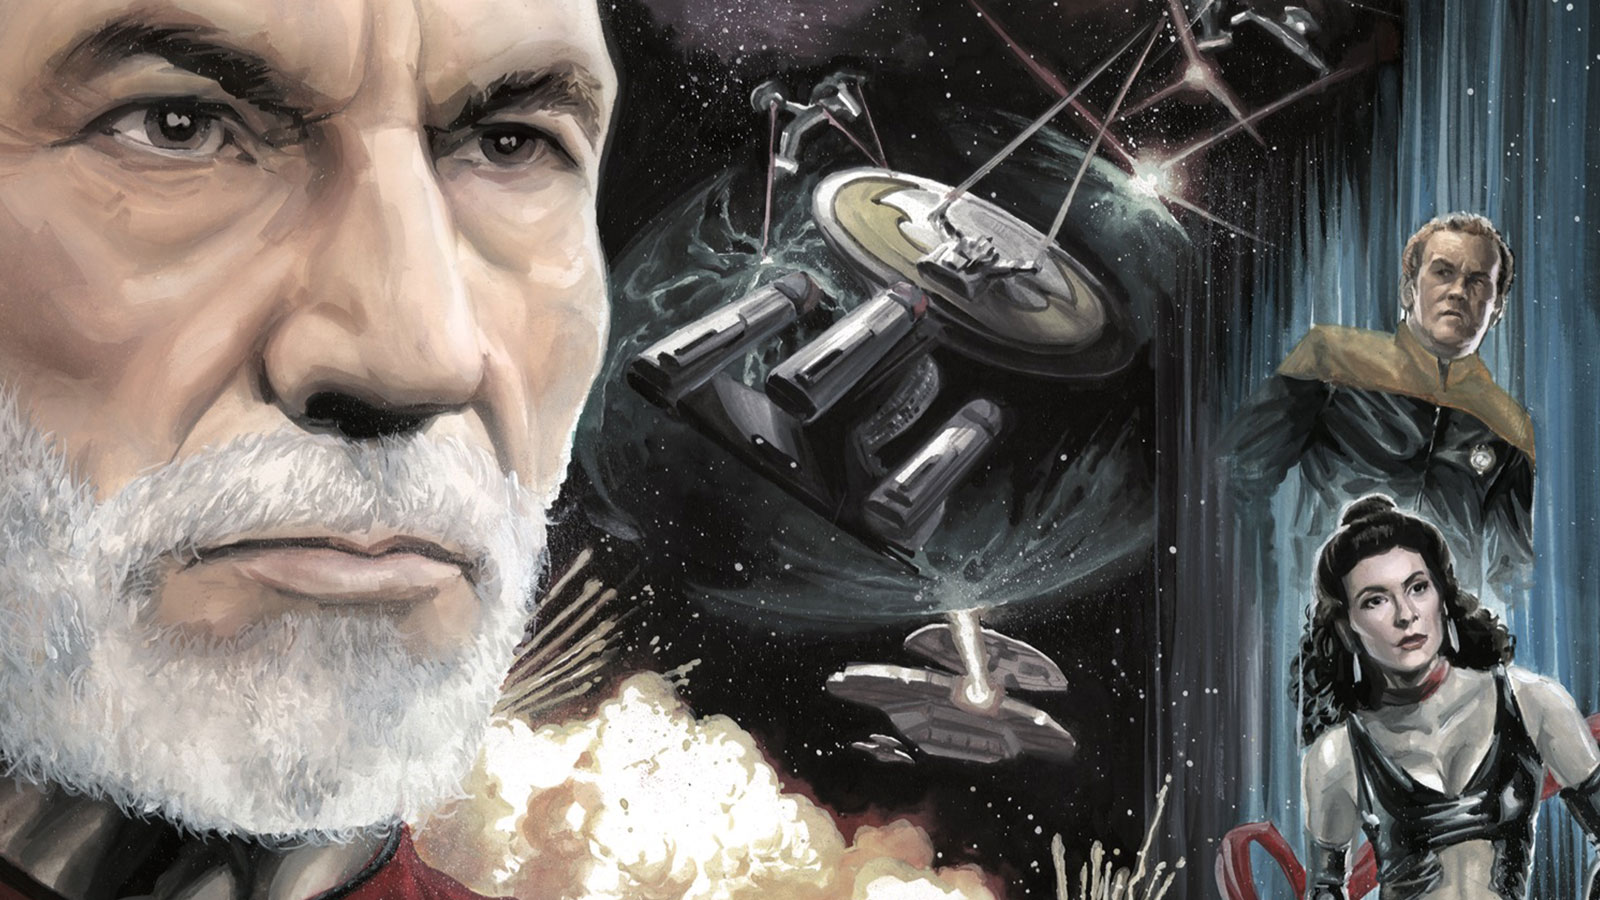 Mirror Picard Returns To Unleash A Year Of Tyranny In STAR TREK: MIRROR WAR